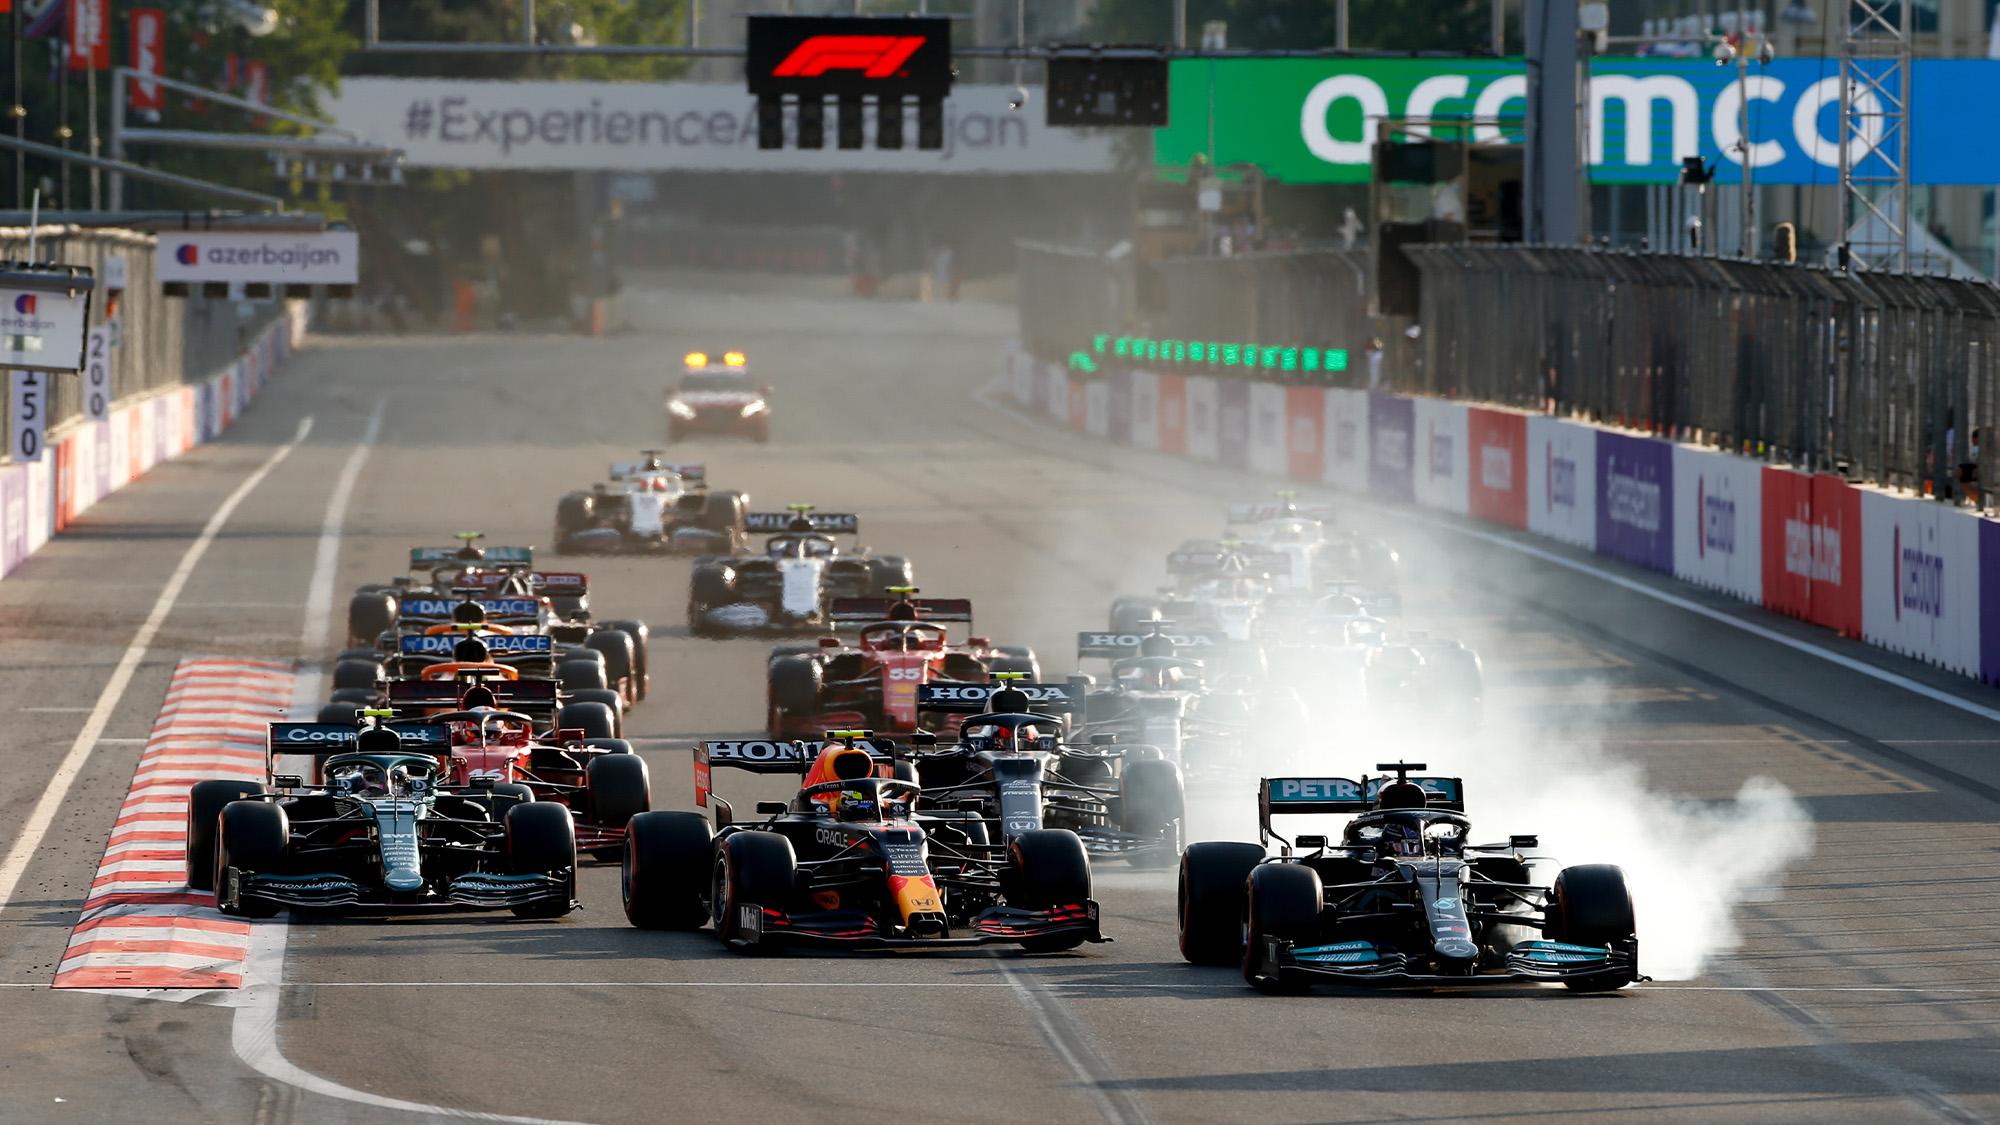 Lewis Hamilton locks up at the 2021 Azerbaijan GP restart